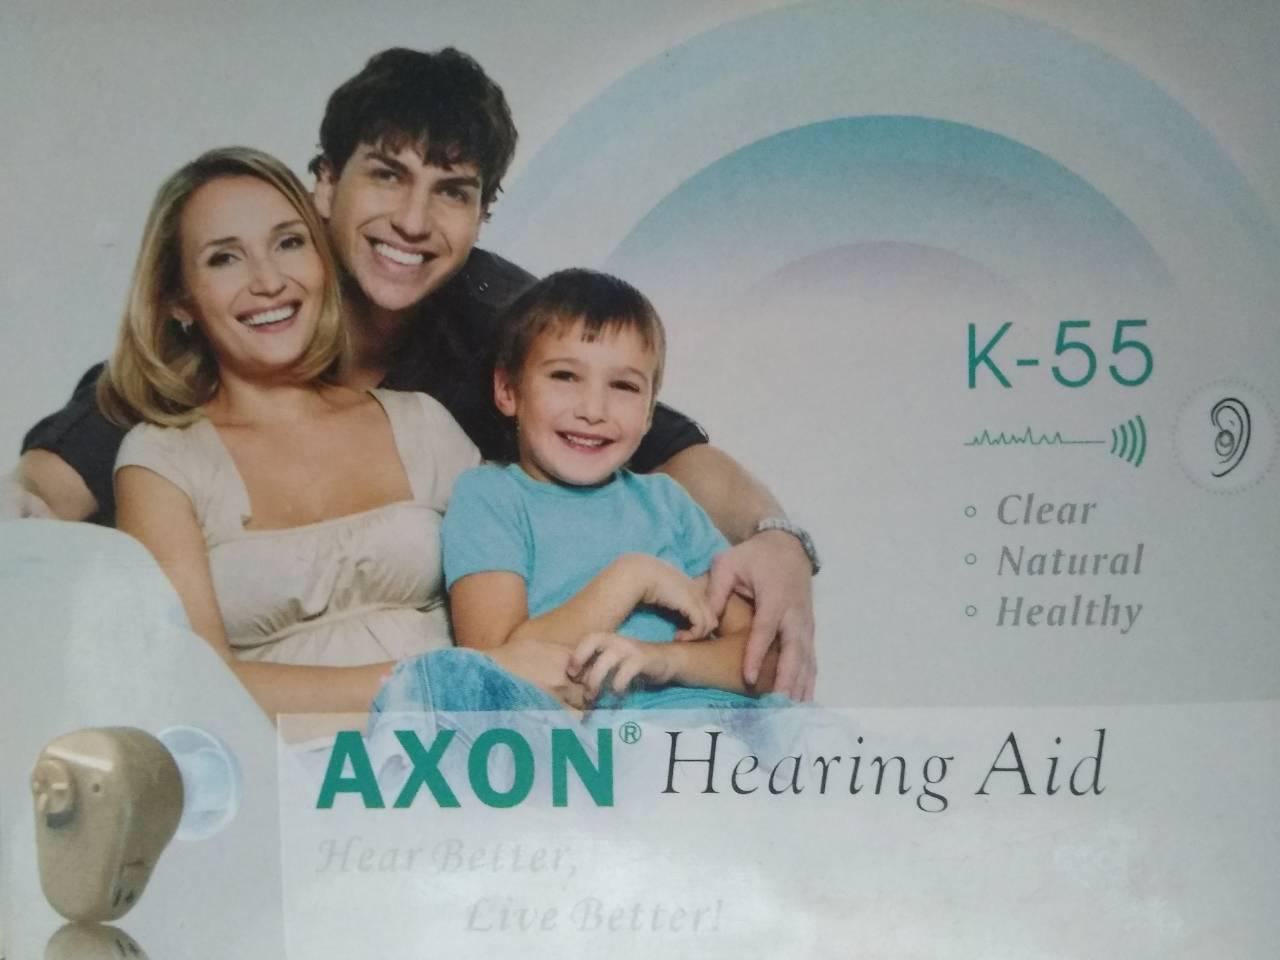 Слуховой аппарат внутриушной Axon K-55